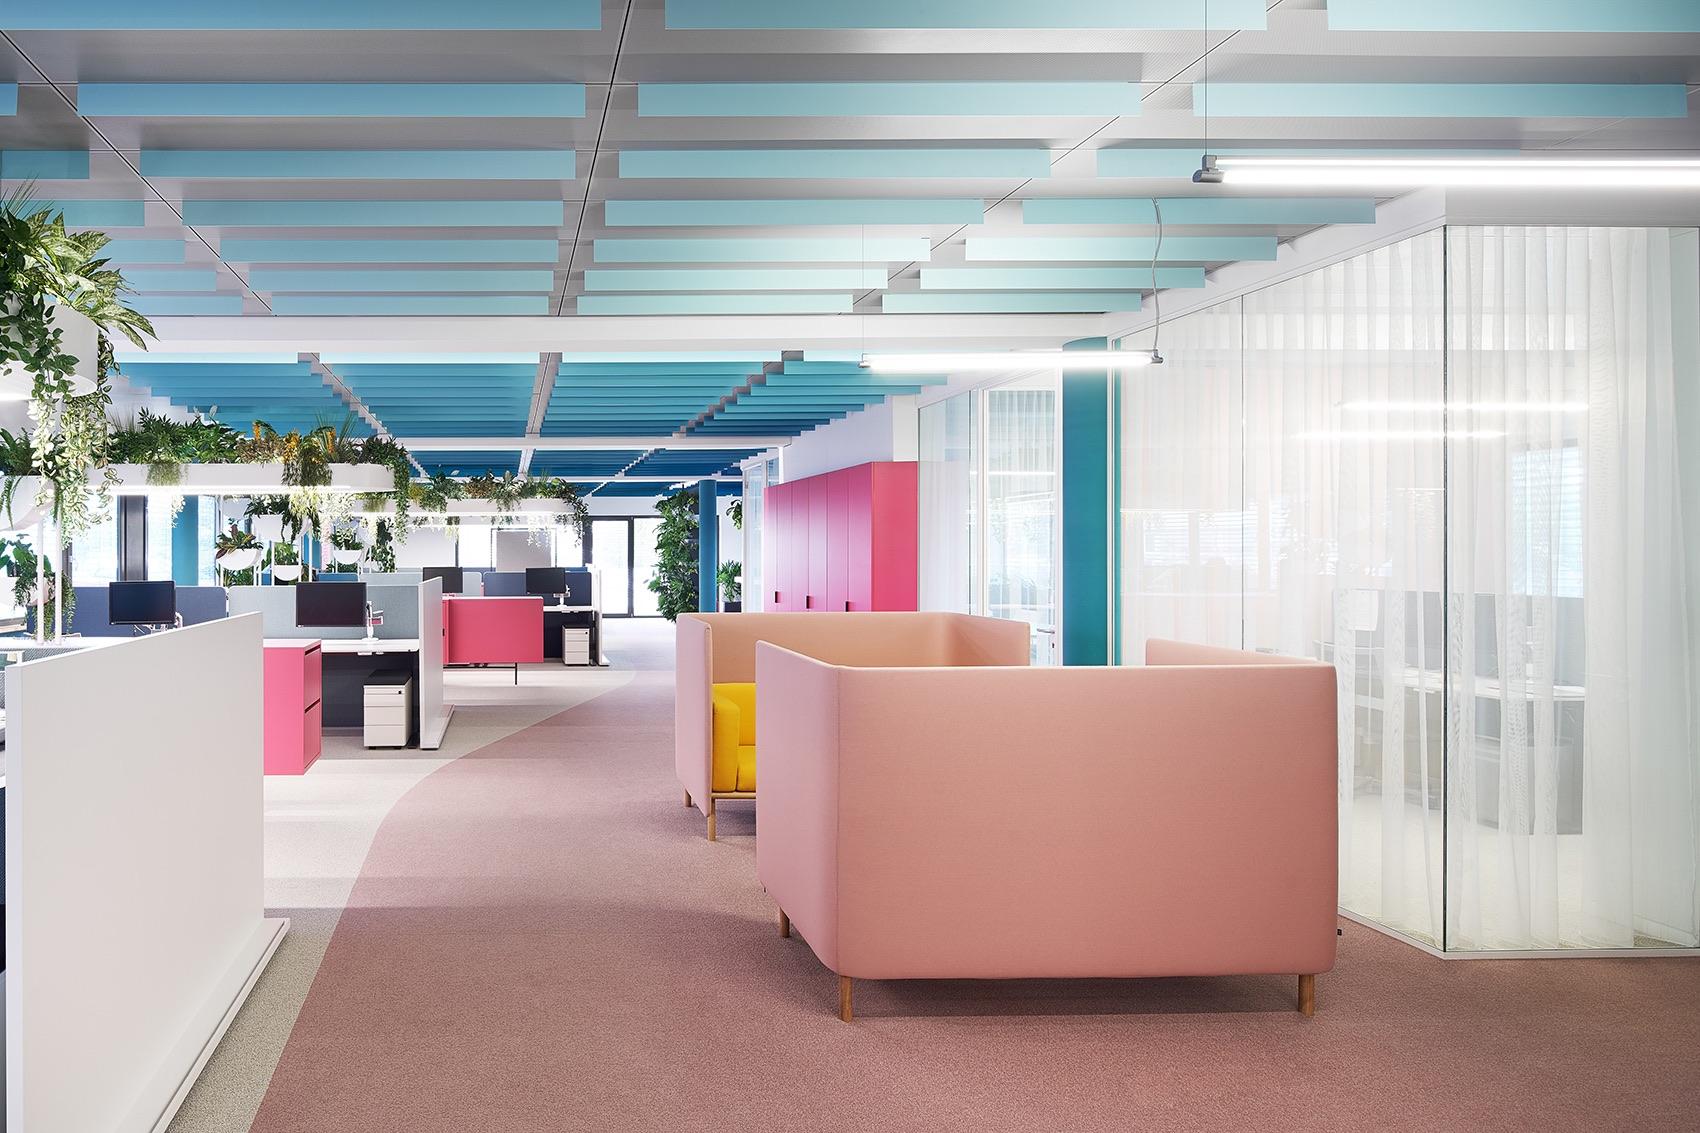 roman-klis-design-office-19